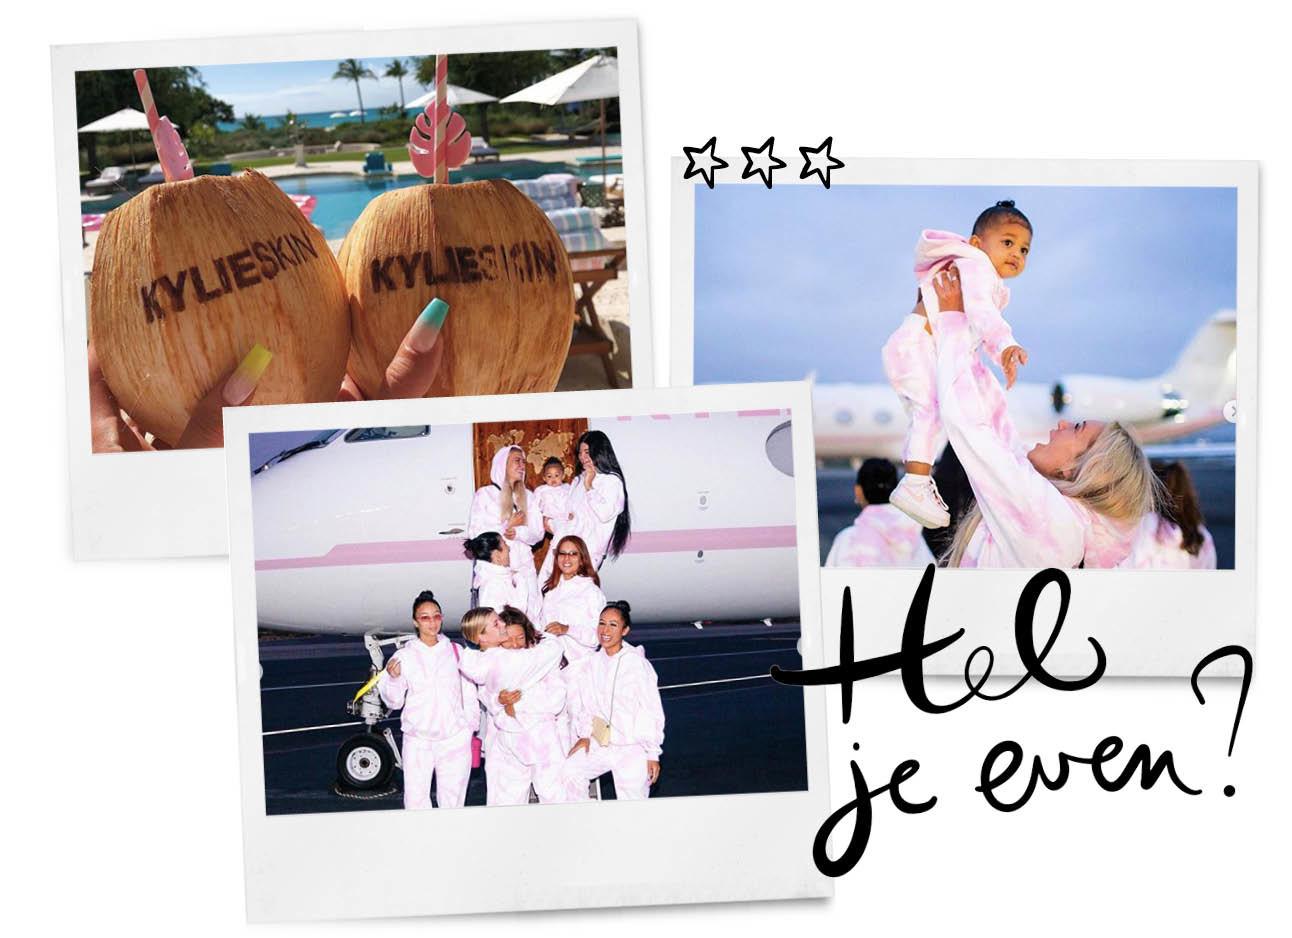 kylie jenner skin trip, airplane, coconuts